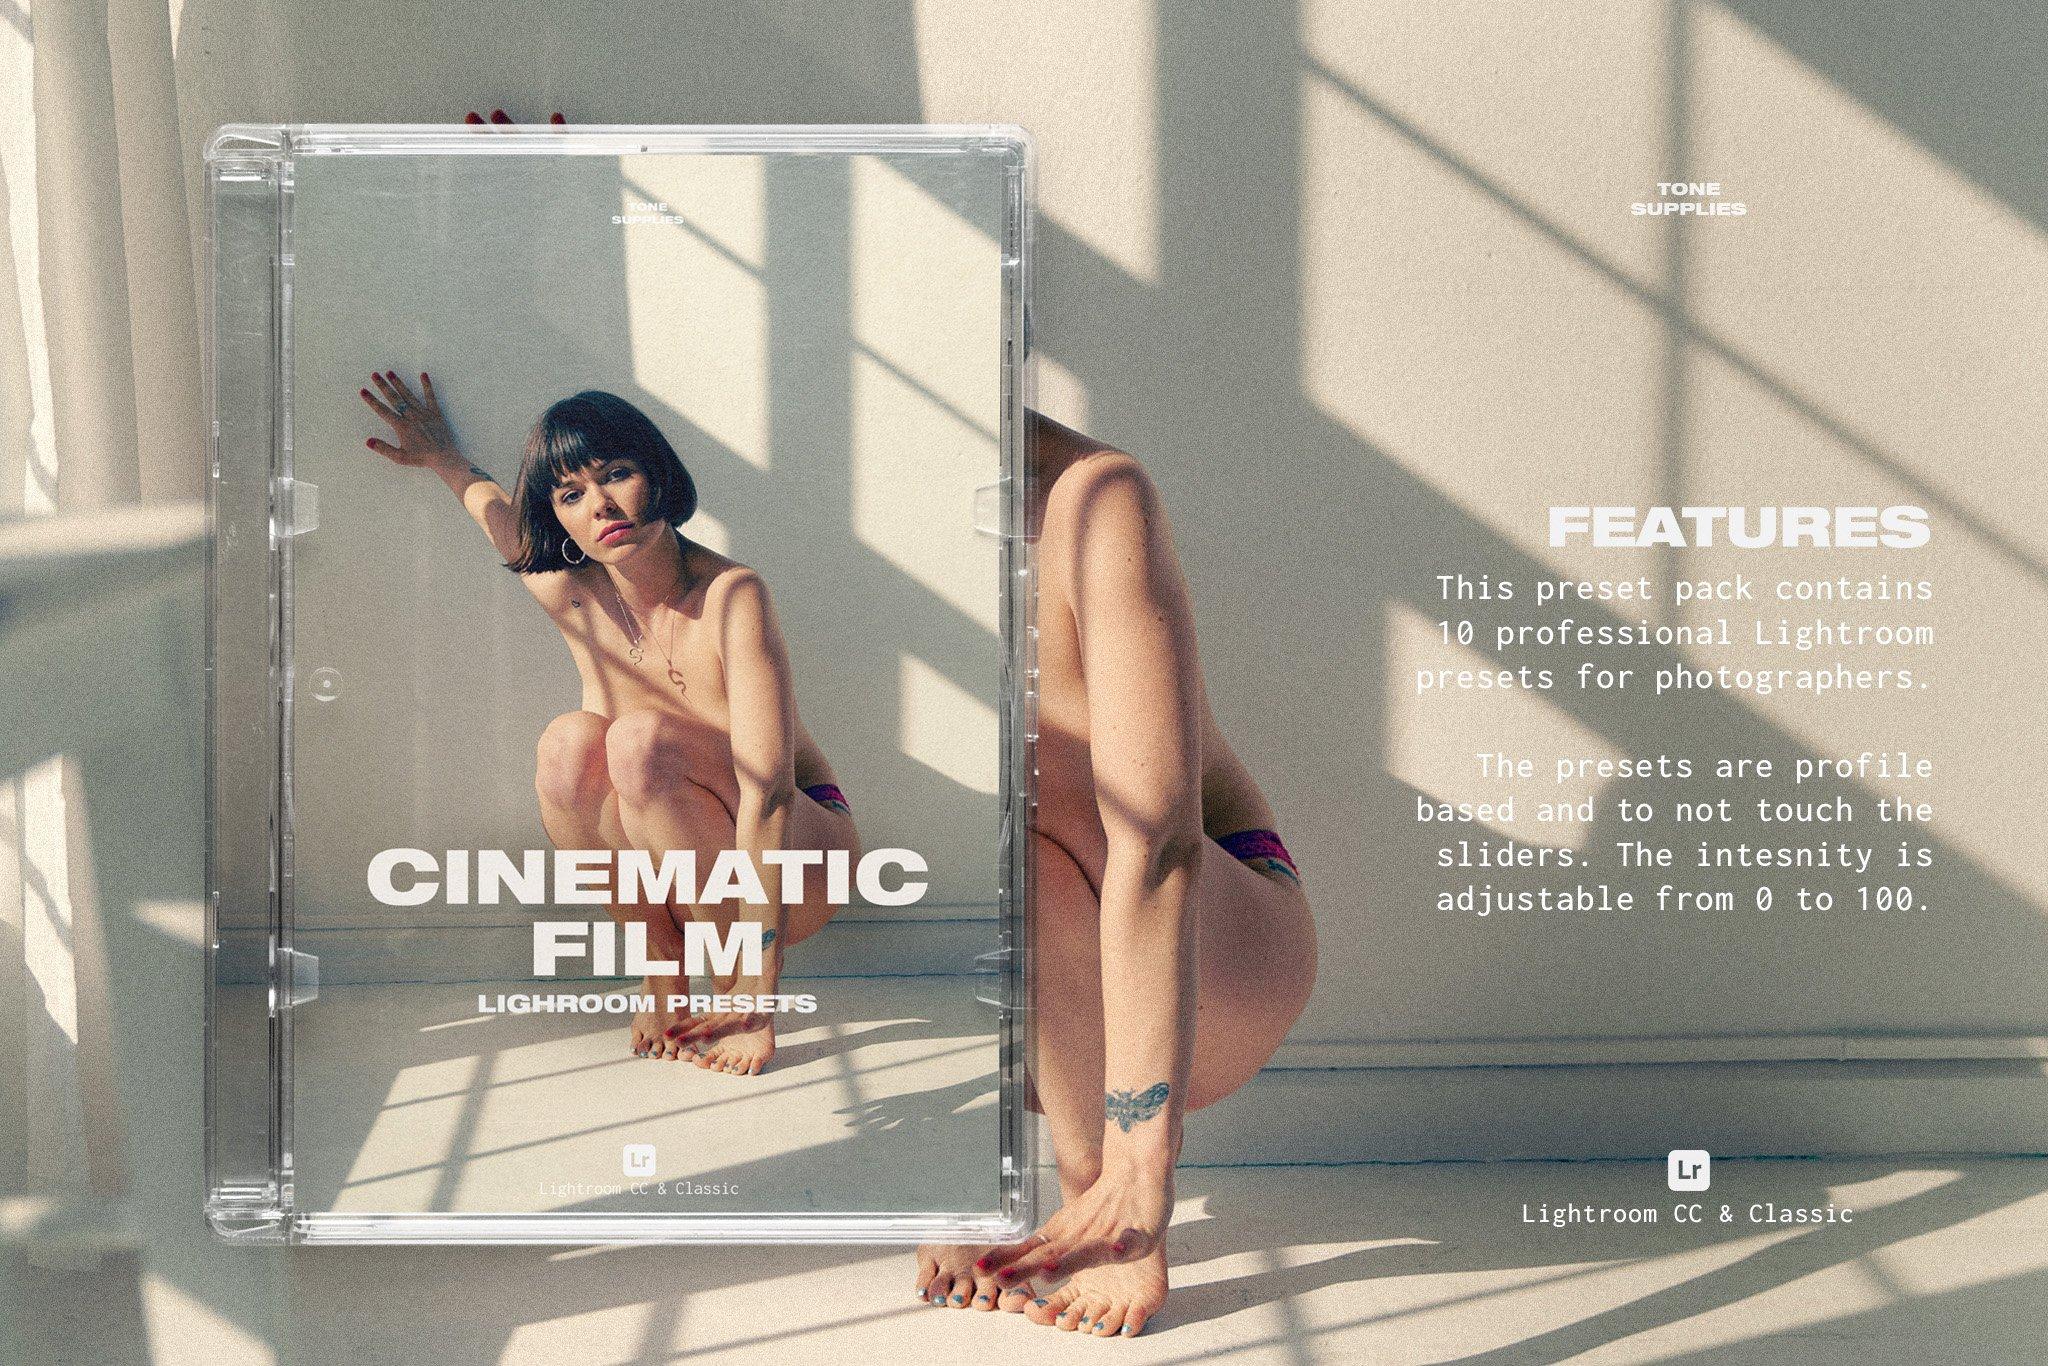 TONE SUPPLIES 10 个专业的电影胶片Lightroom预设(4344)插图(1)